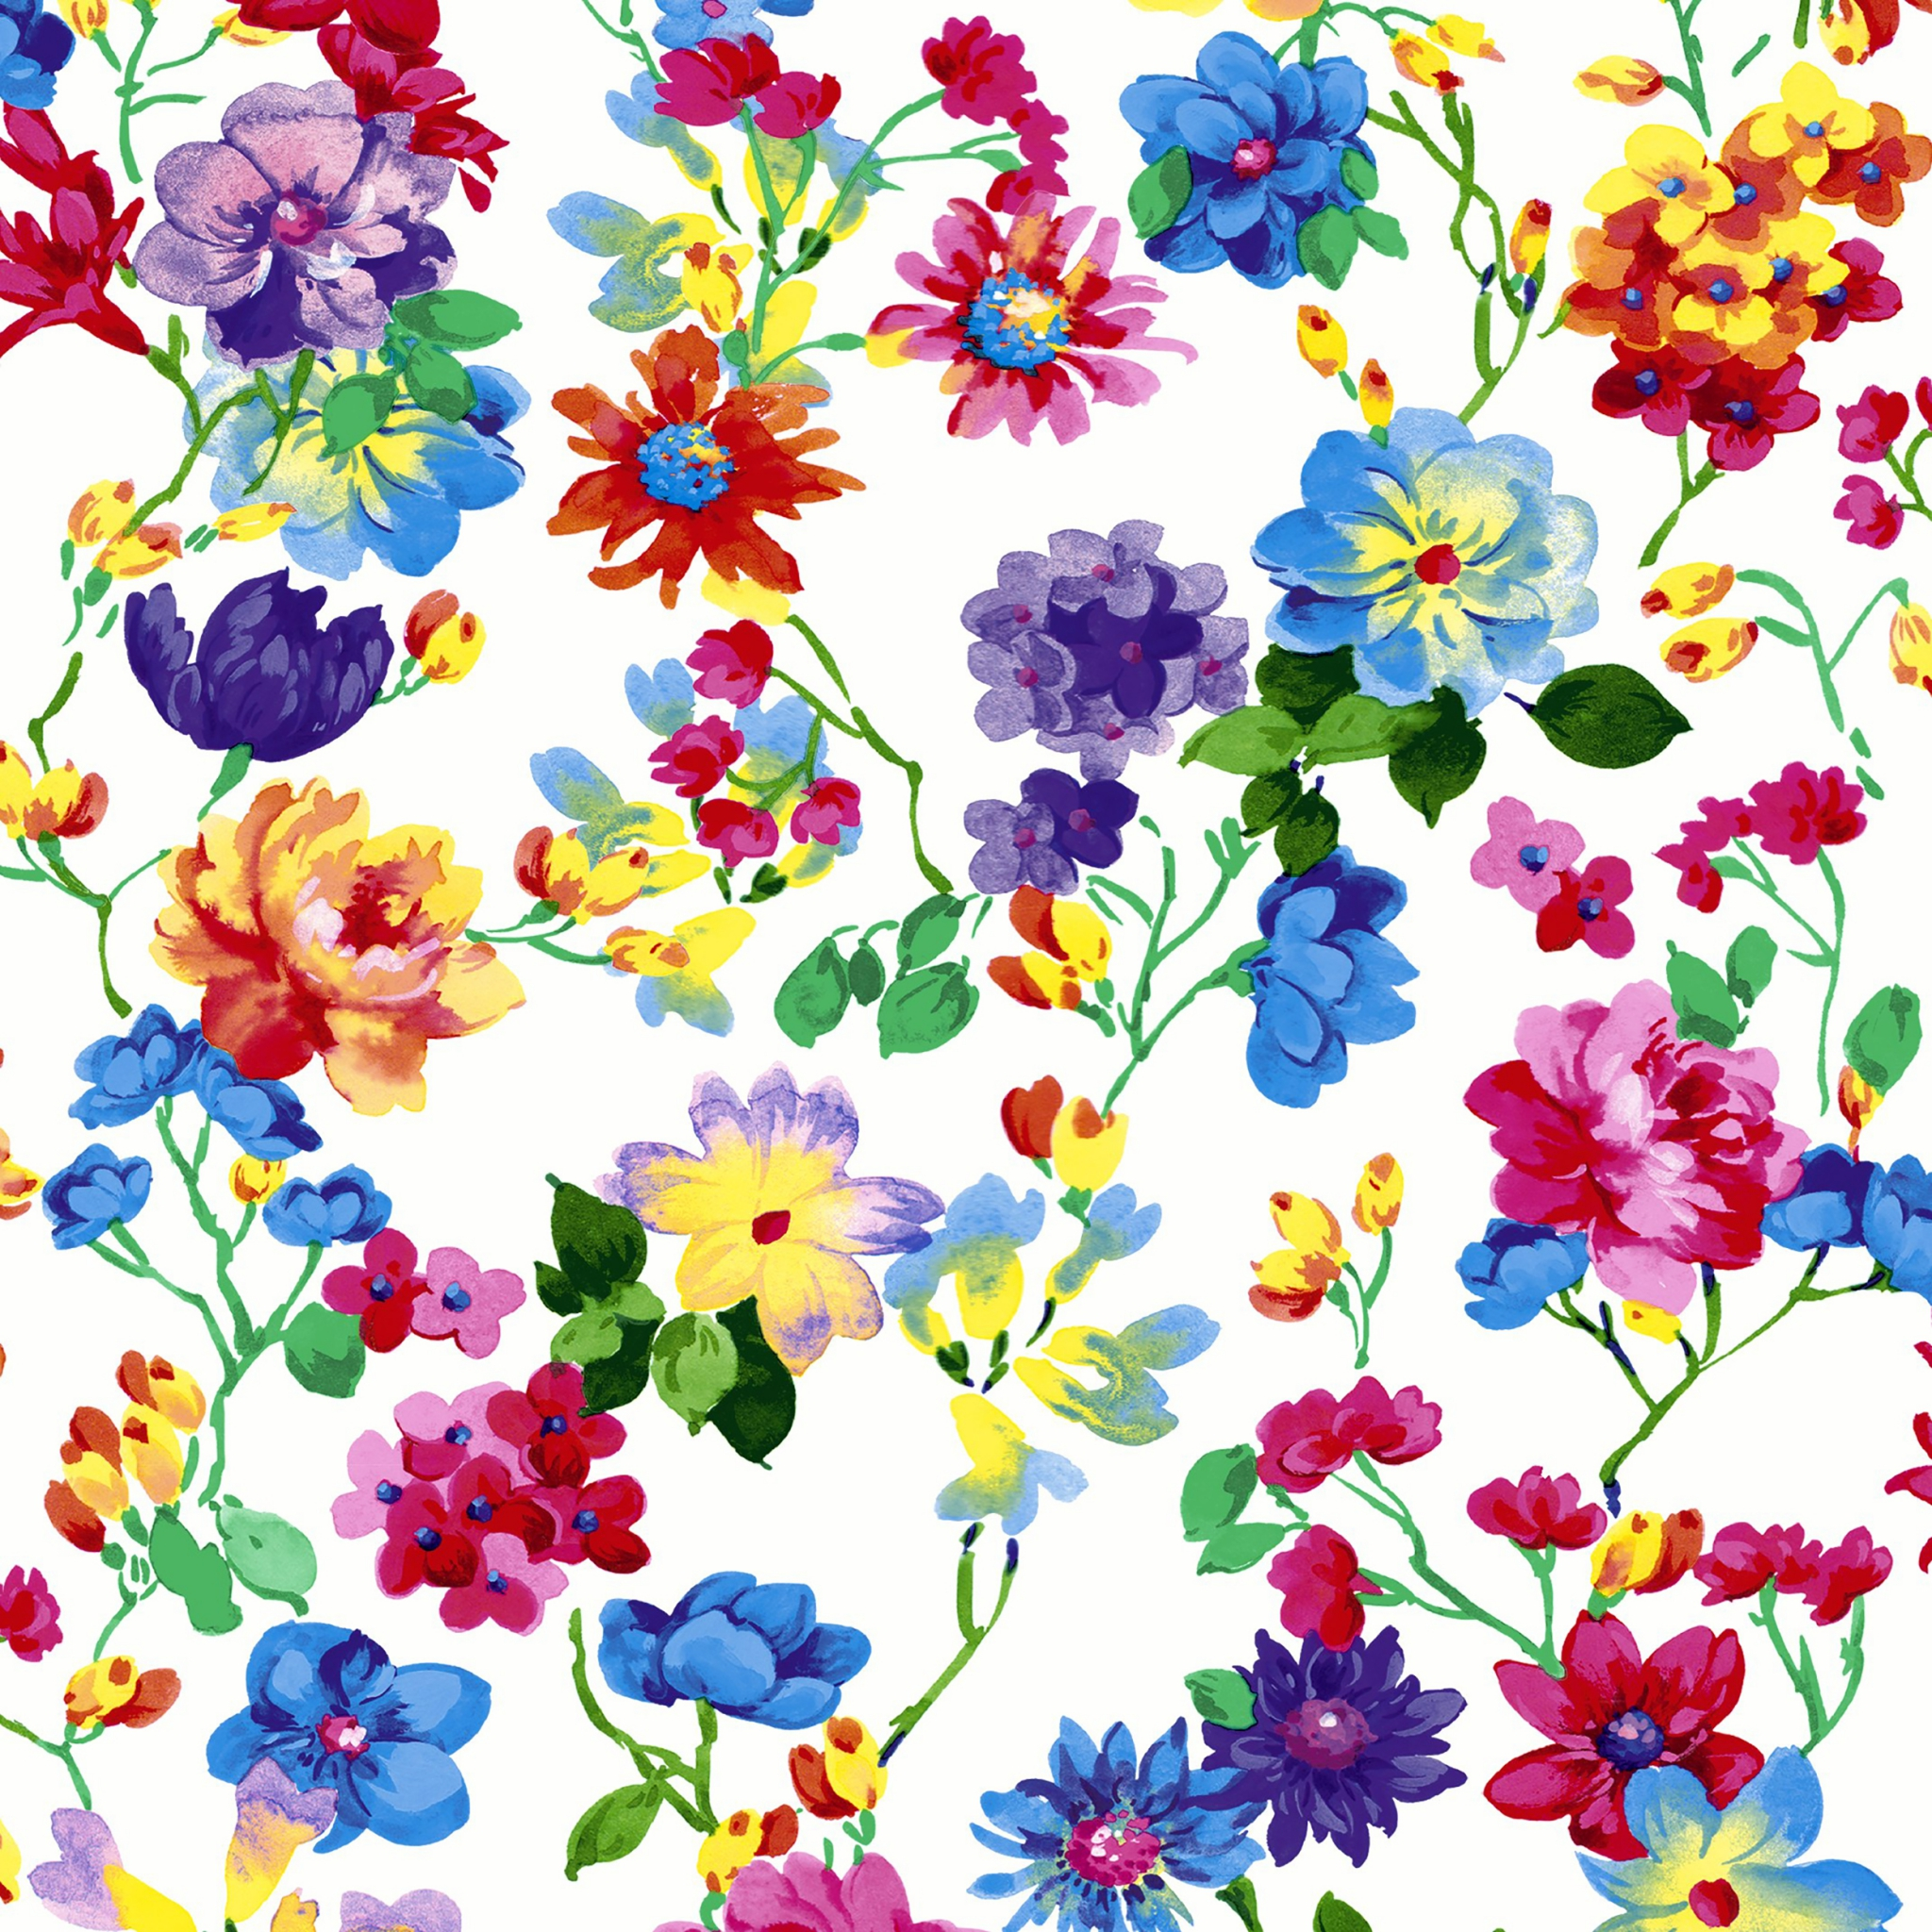 Servietten 33x33 cm - Bed of flowers